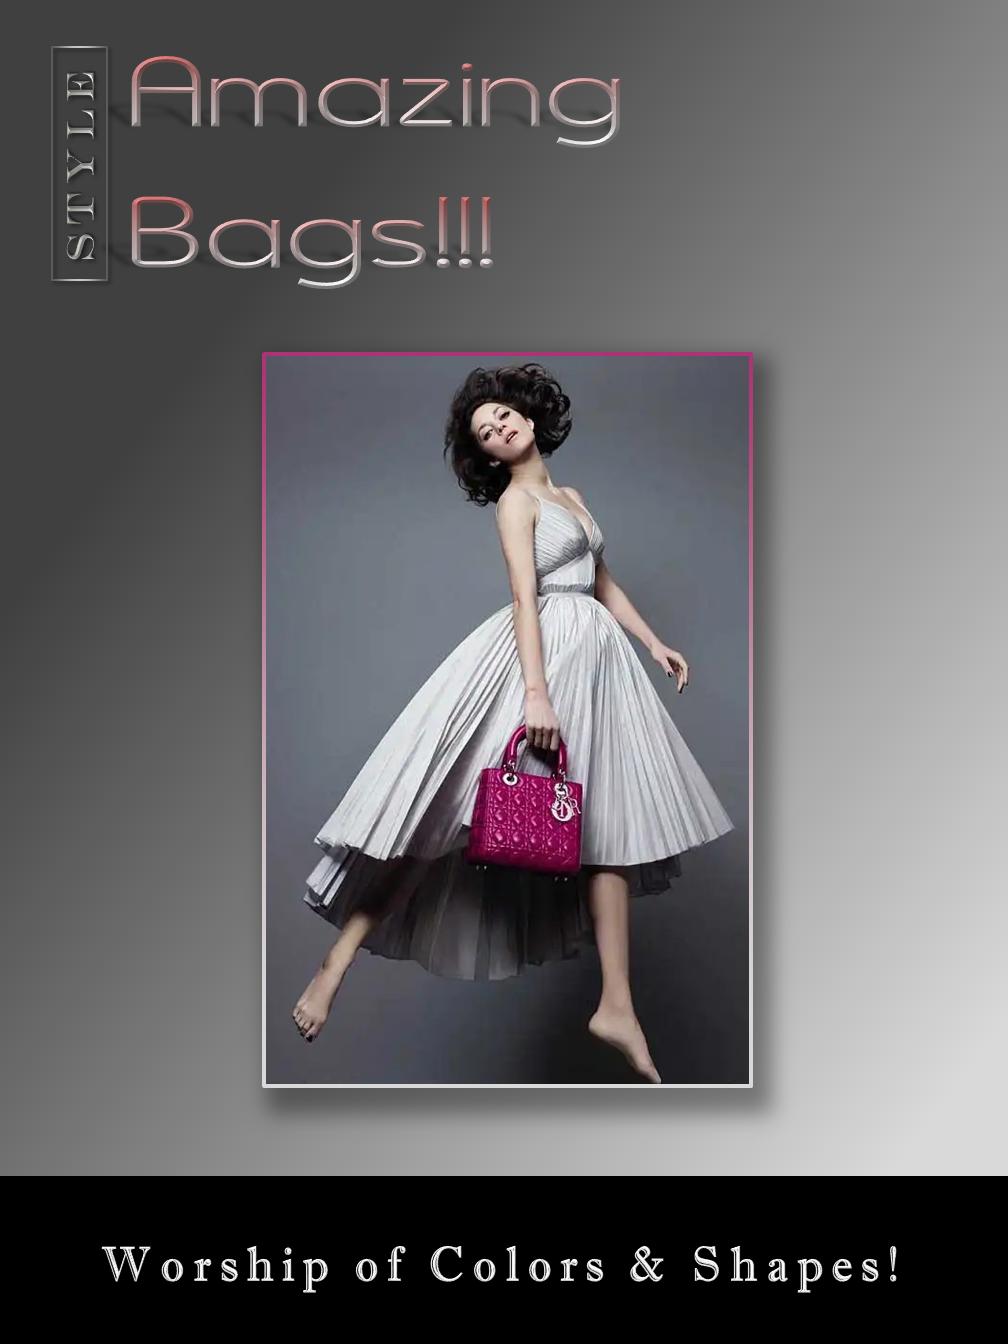 Amazing Bags